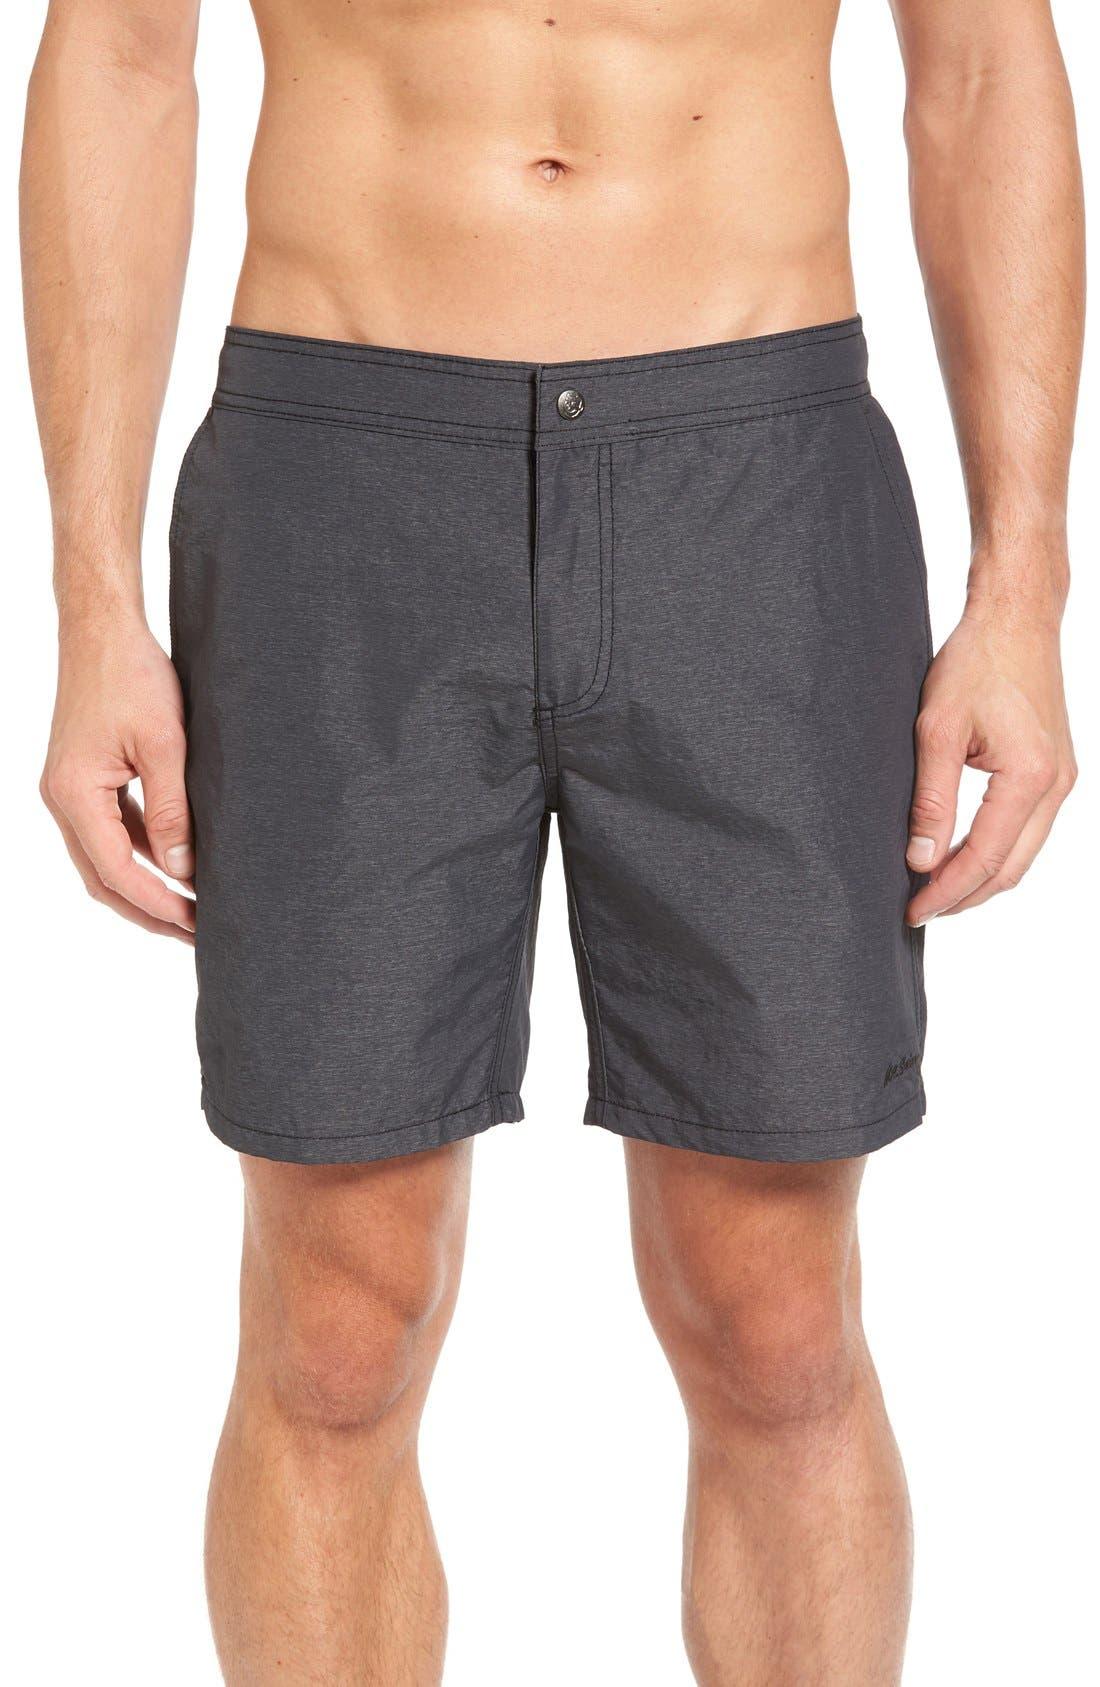 Hybrid Shorts,                             Main thumbnail 1, color,                             001